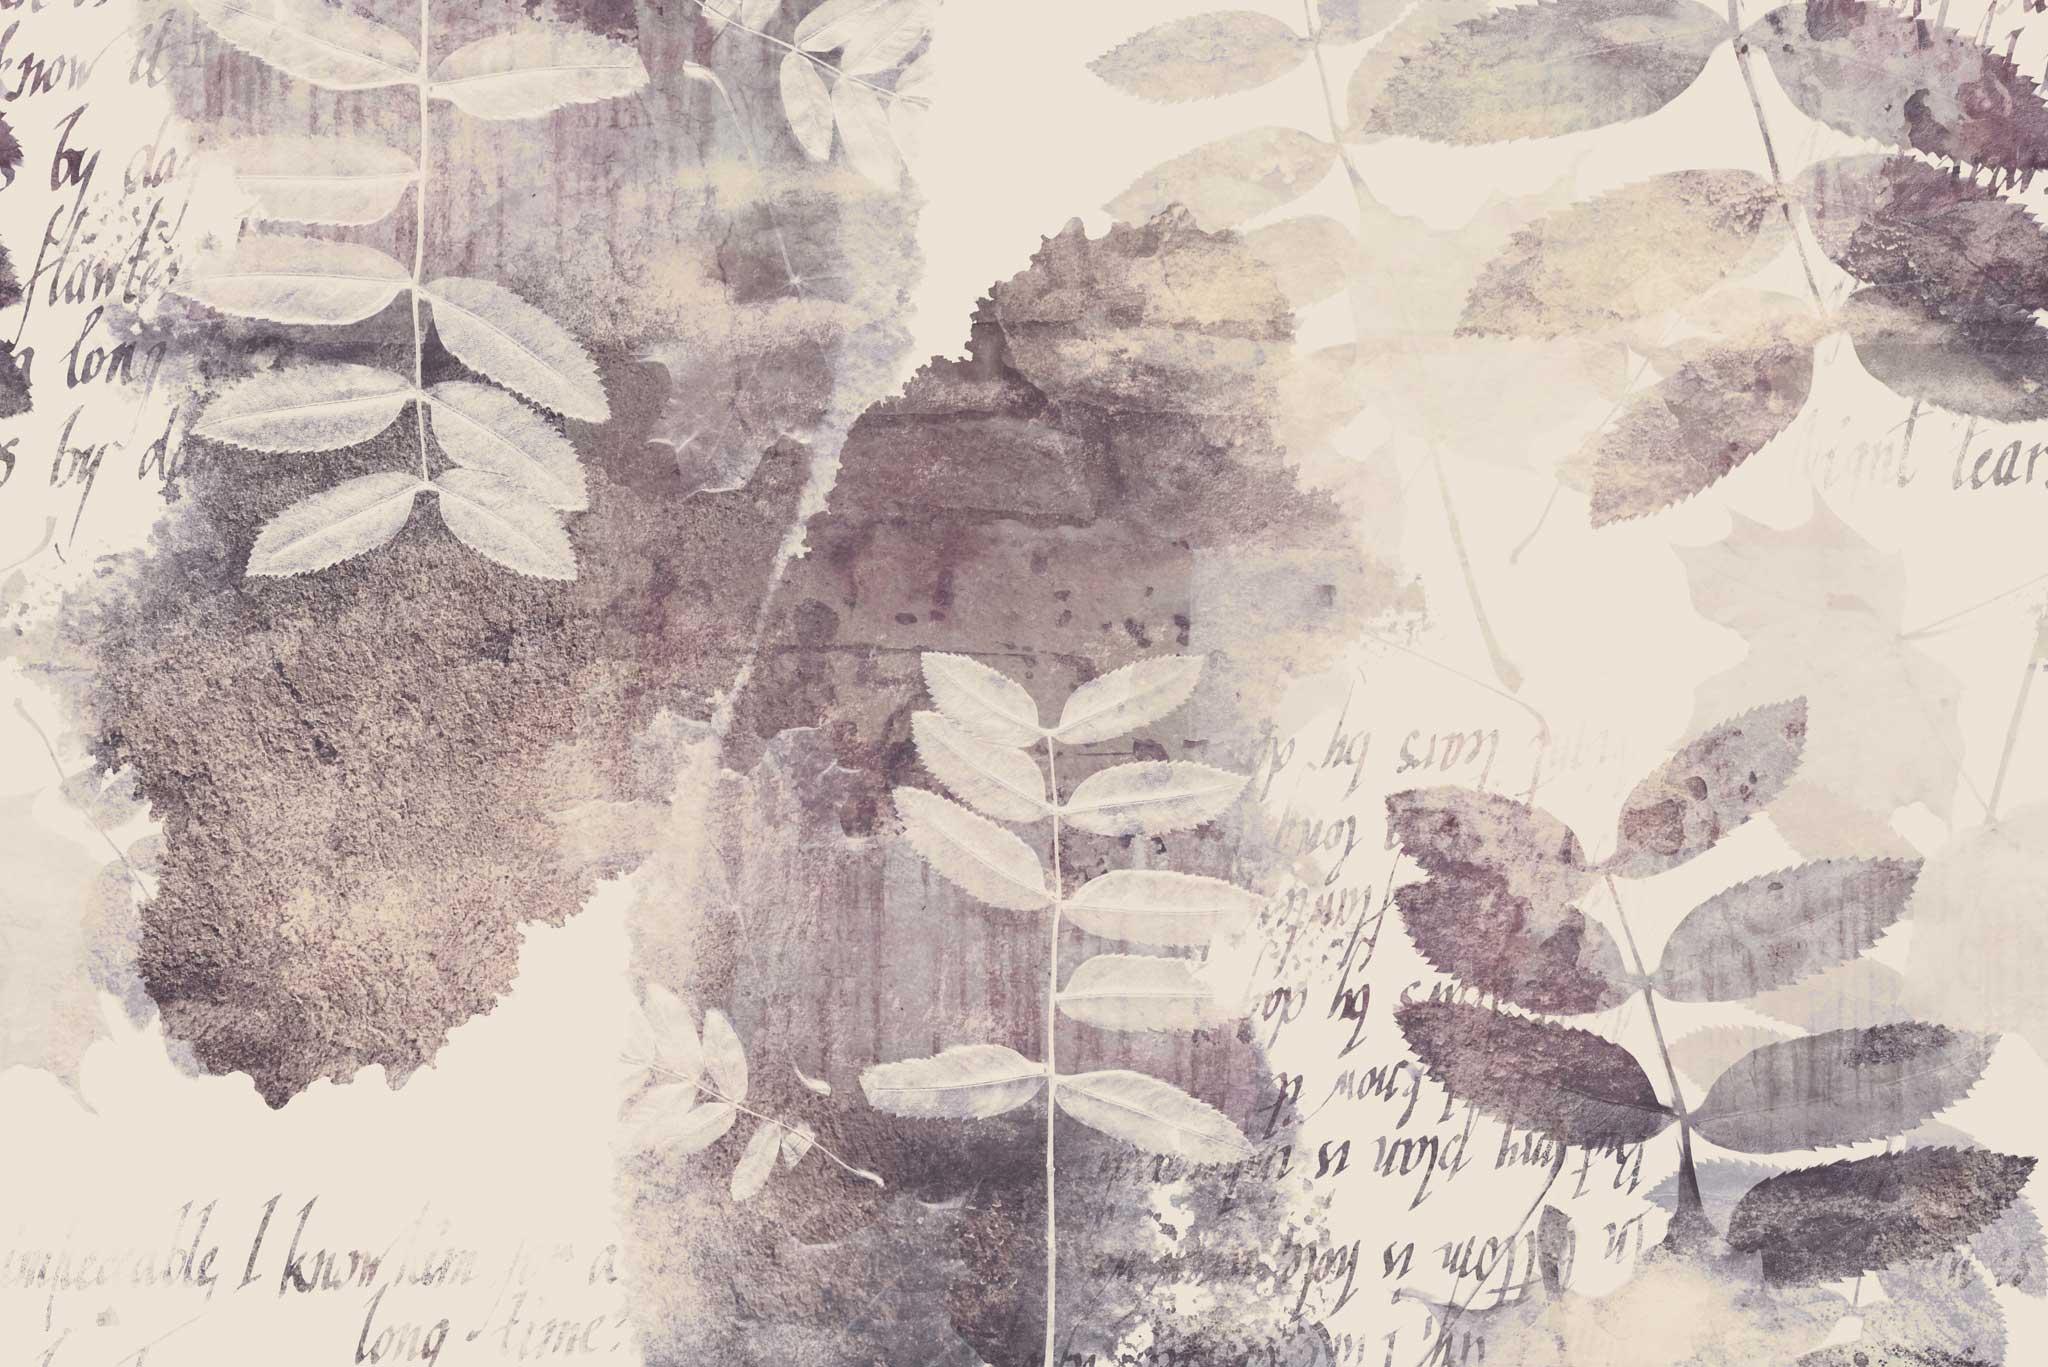 tapet-fototapet-design-decor-mural-customizabil-comanda-personalizat-bucuresti-daring-prints-motiv-model-vintage-romantic-vegetal-frunze-pastel